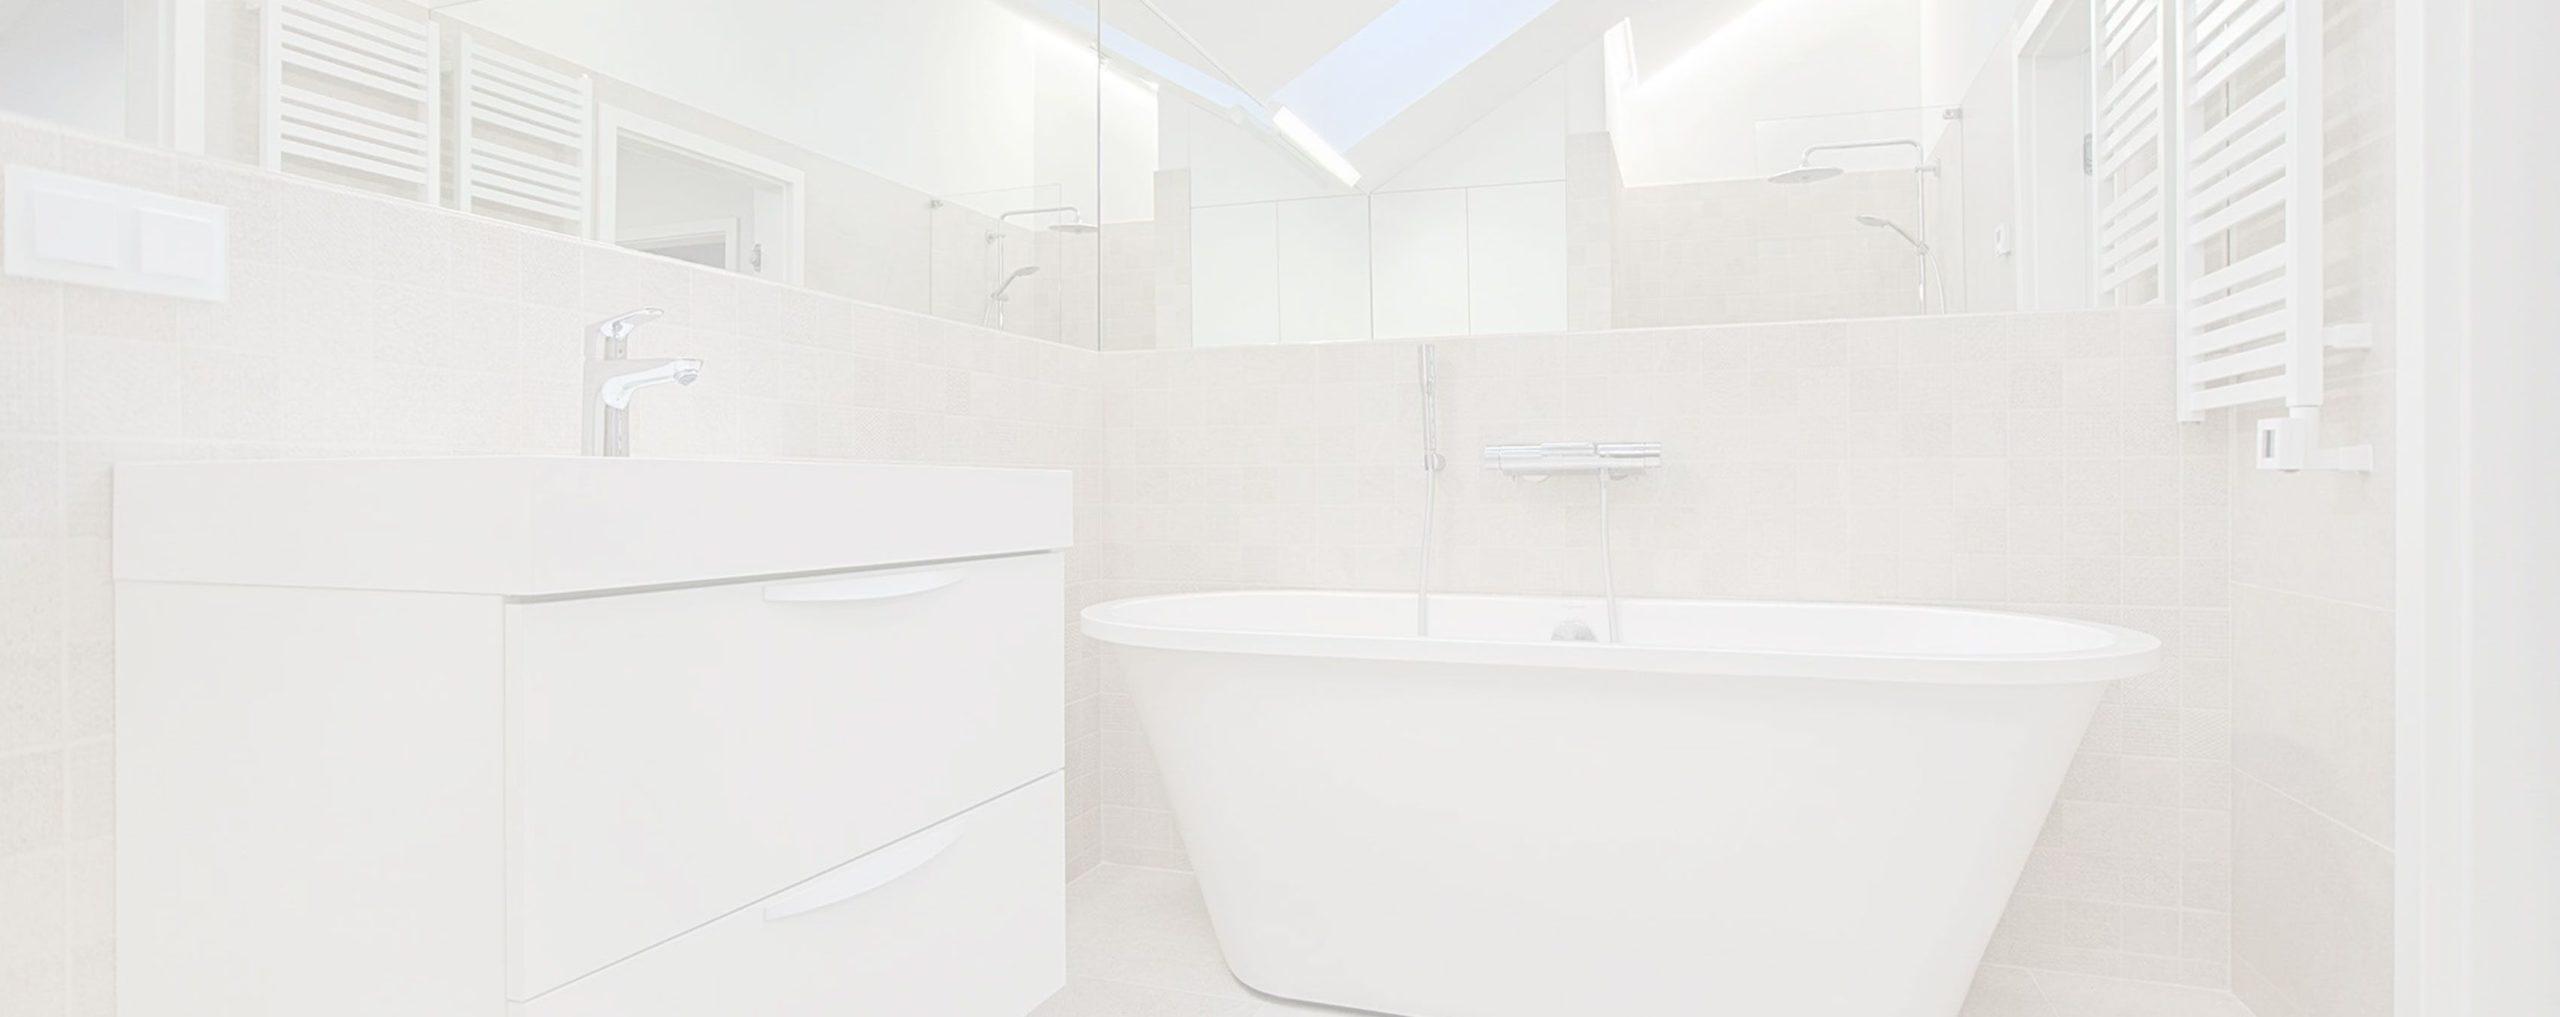 kitchen-bathroom-feature-image